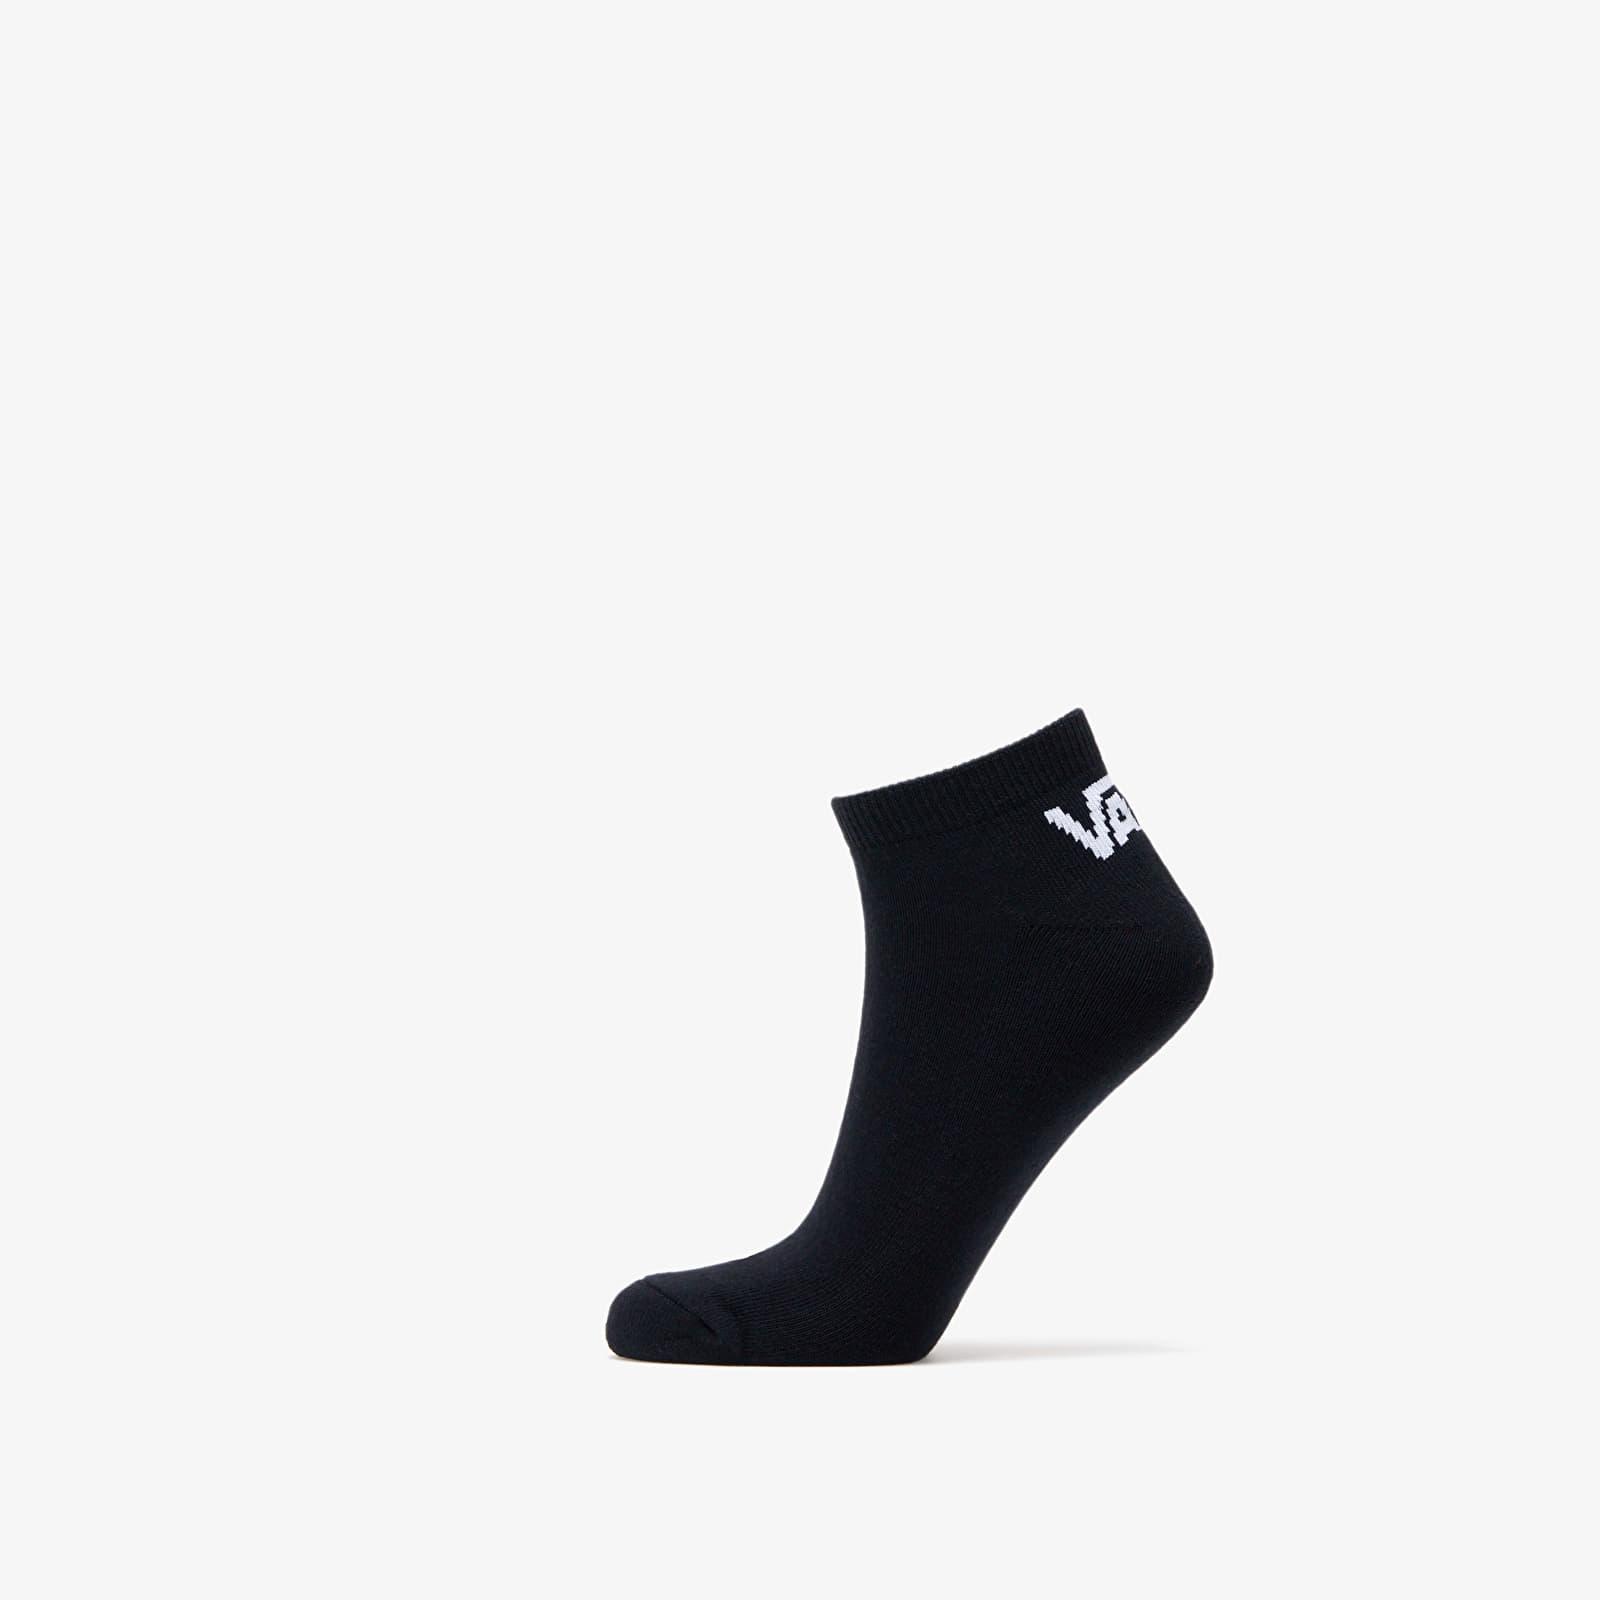 Чорапи Vans Classic Low 3 Pair Socks Black